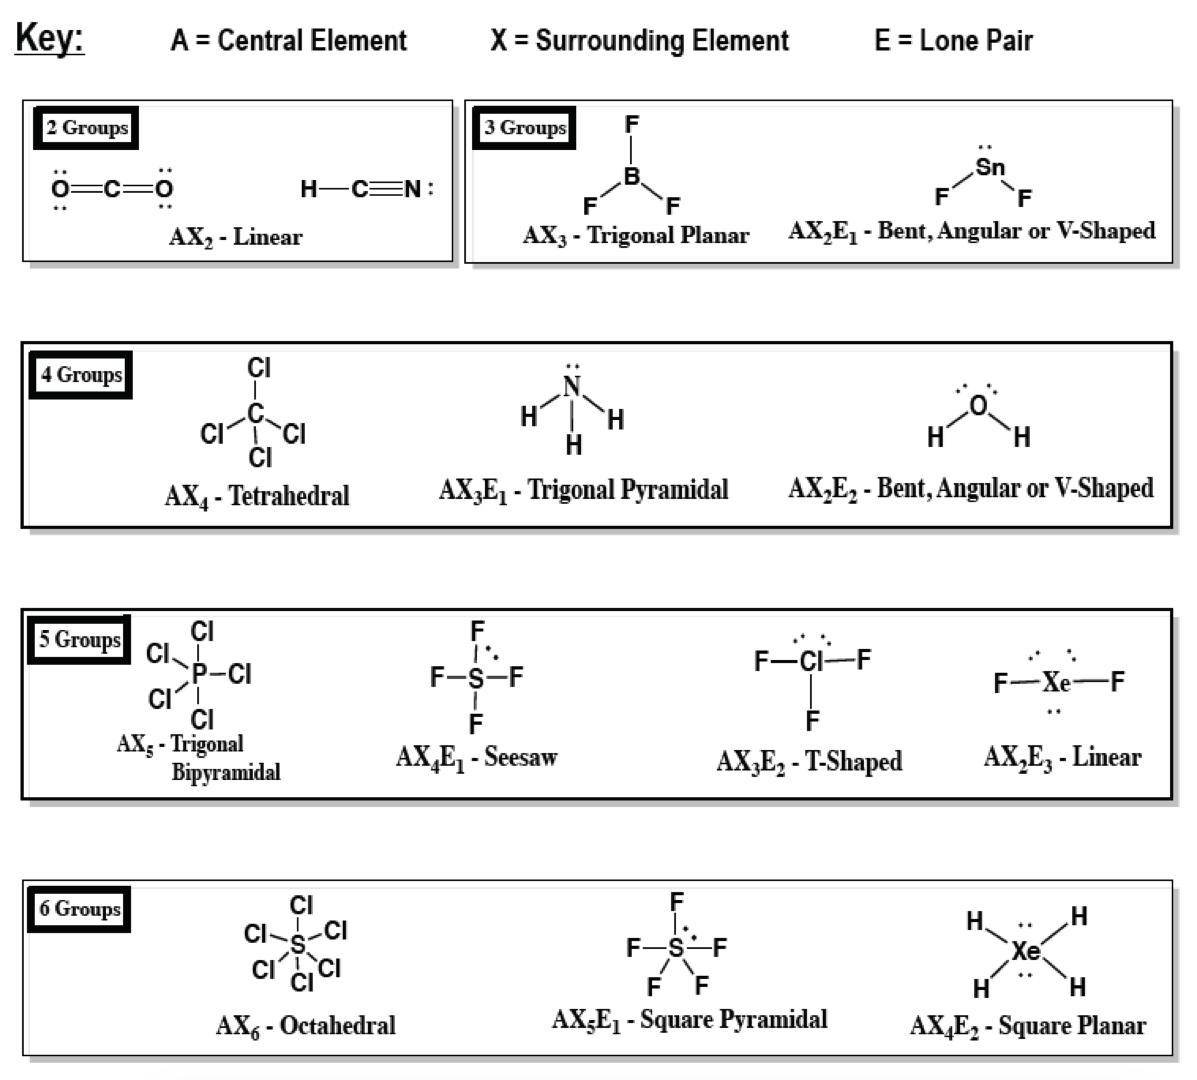 The Molecule Called Diazene Has The Formul Clutch Prep